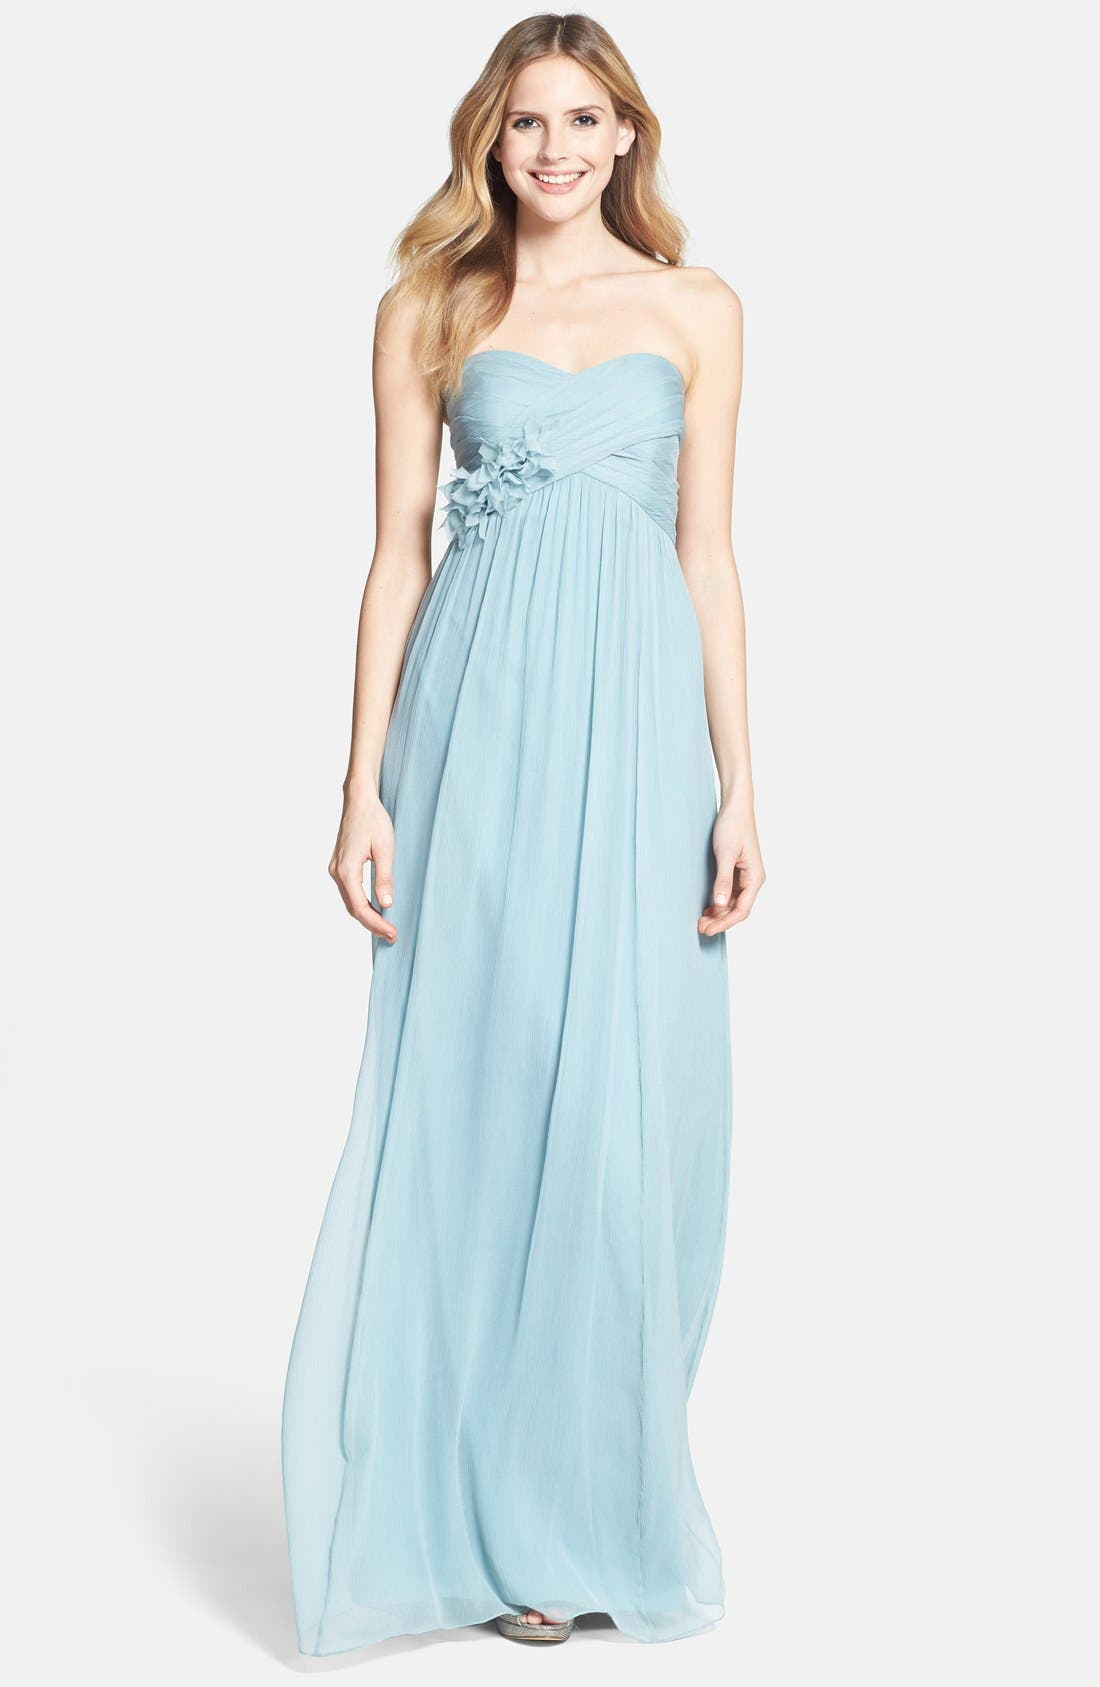 Alternate Image 1 Selected - Jenny Yoo 'Sienna' Strapless Crinkle Silk Chiffon Dress